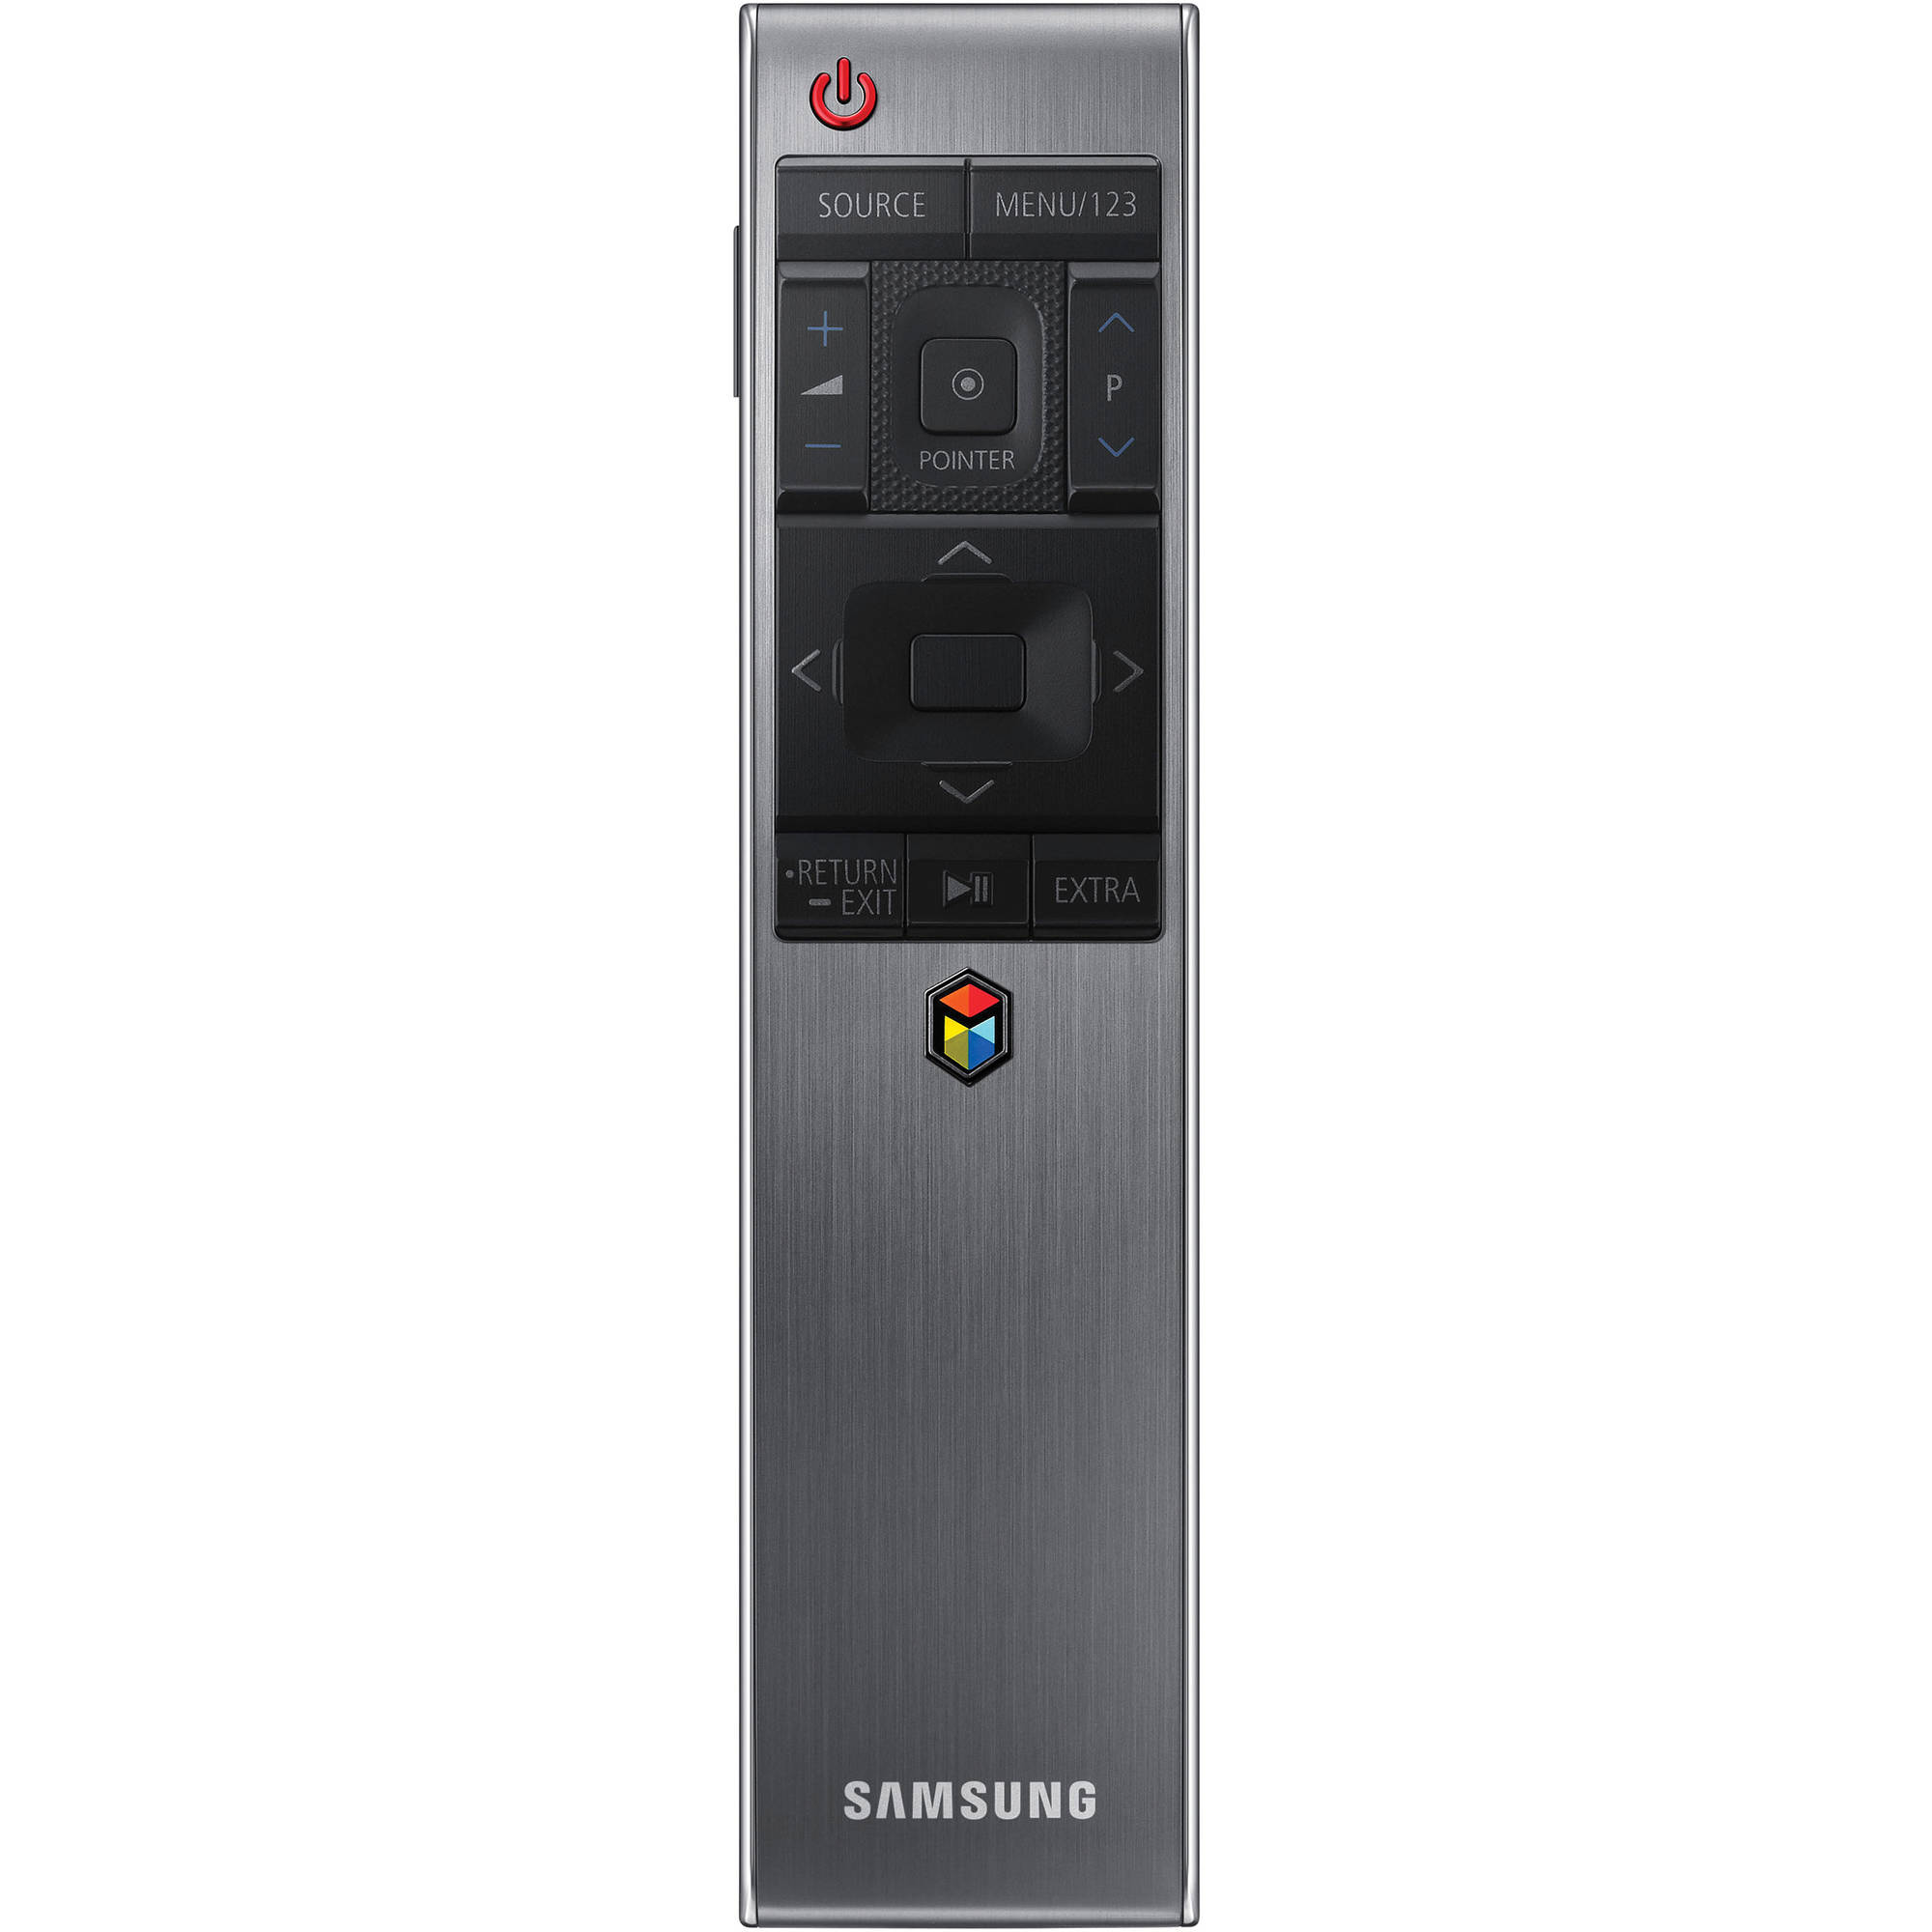 Samsung JS8500 48